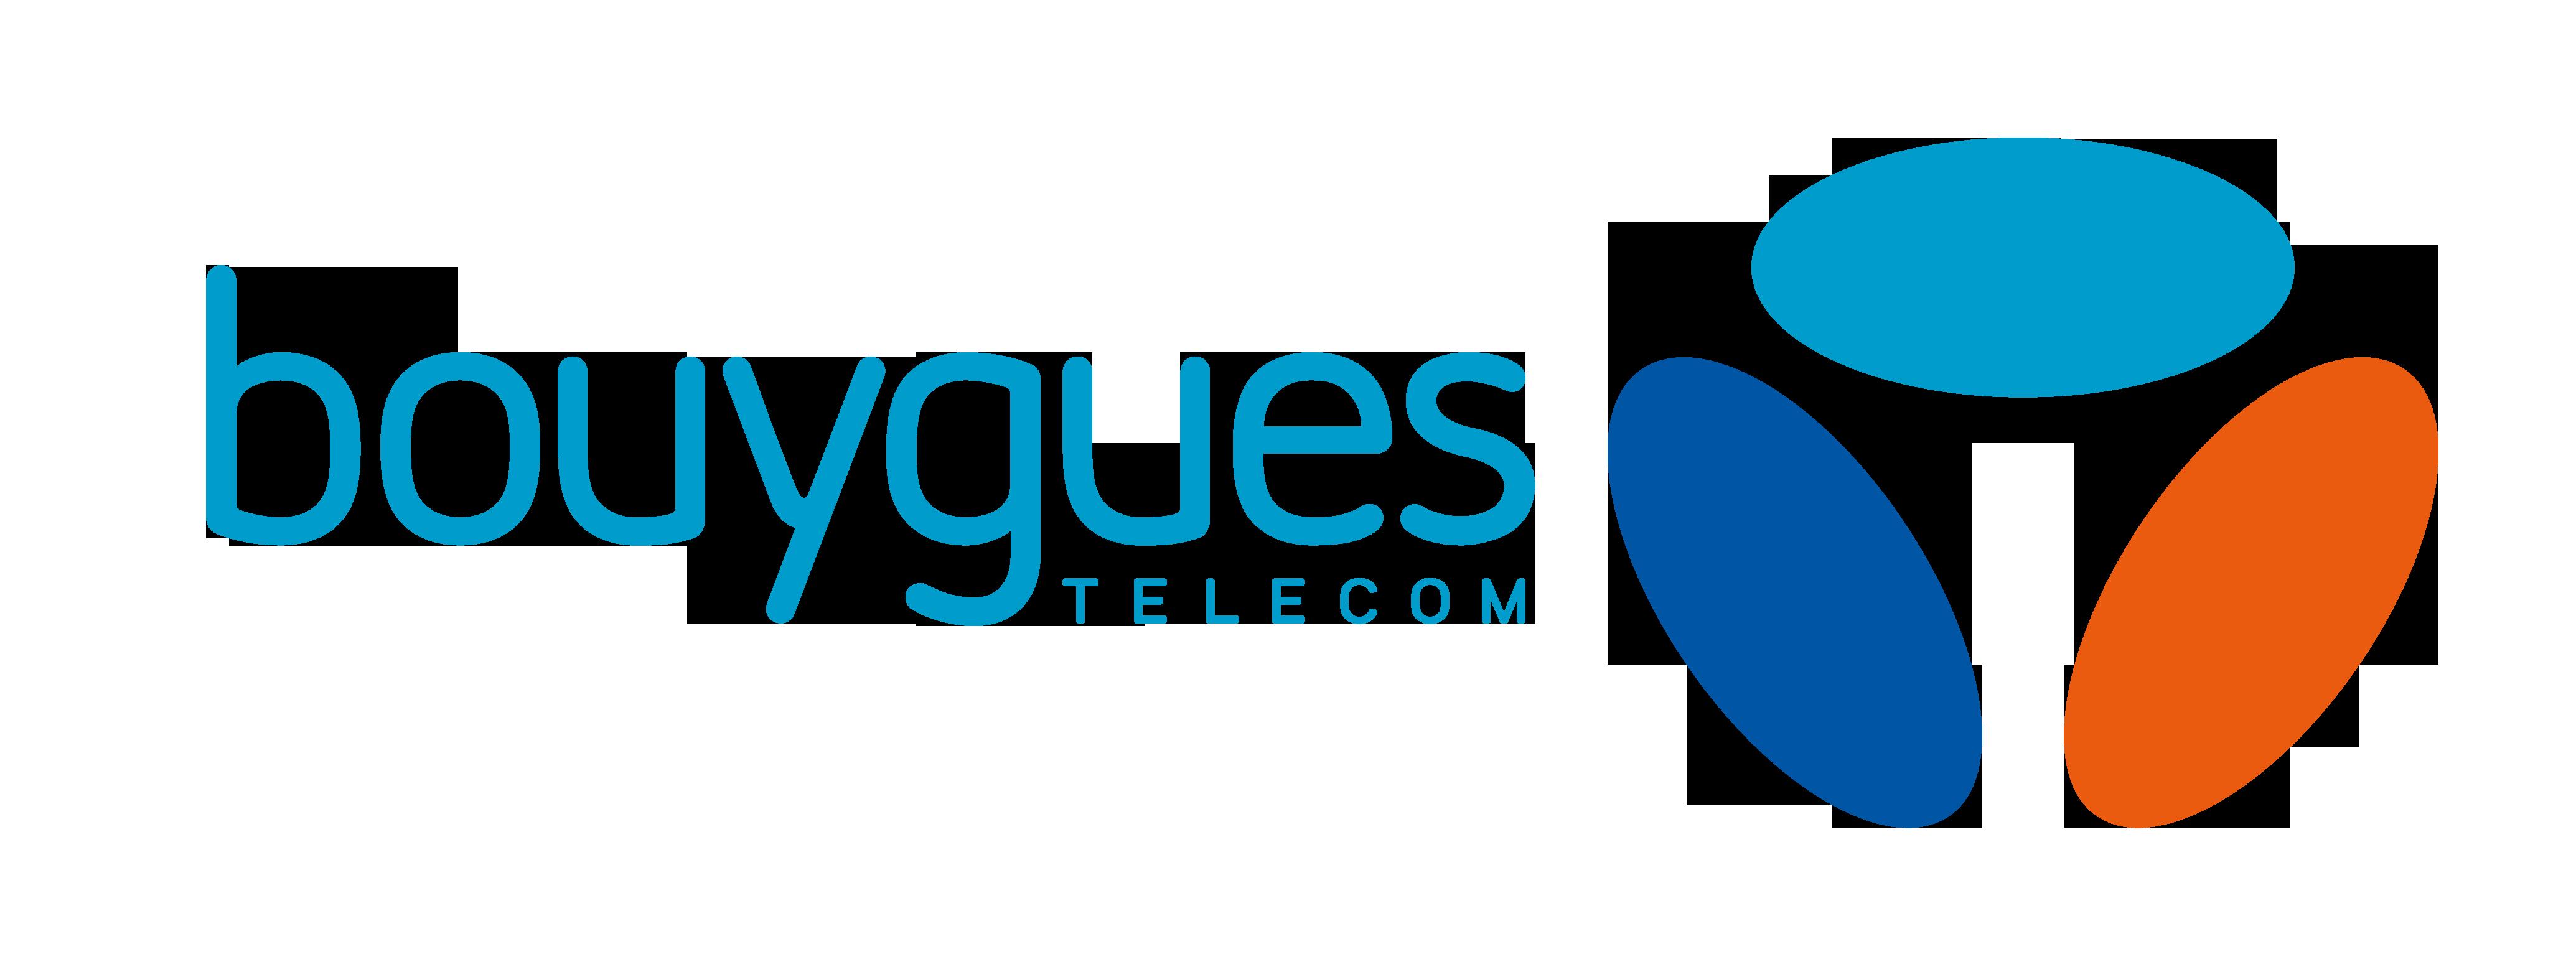 Bouygues Telecom - Bouygues Telecom Logo PNG